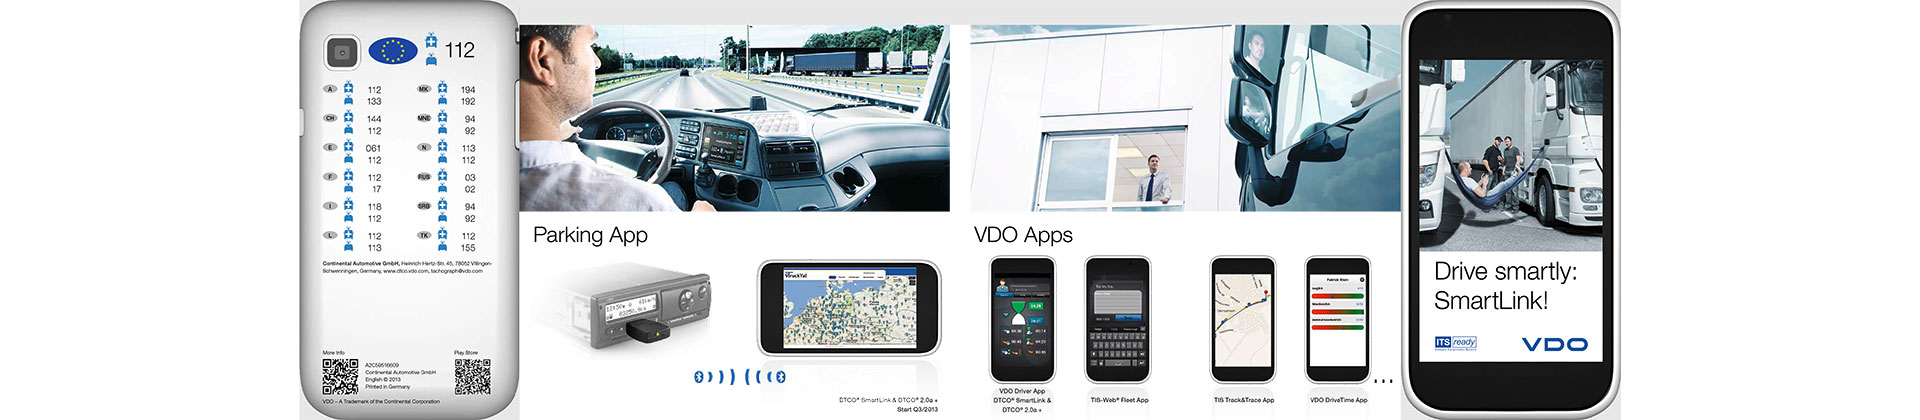 VDO_ContiSys_ITS-SmartLink_Mailing_2013_EN_MC-1